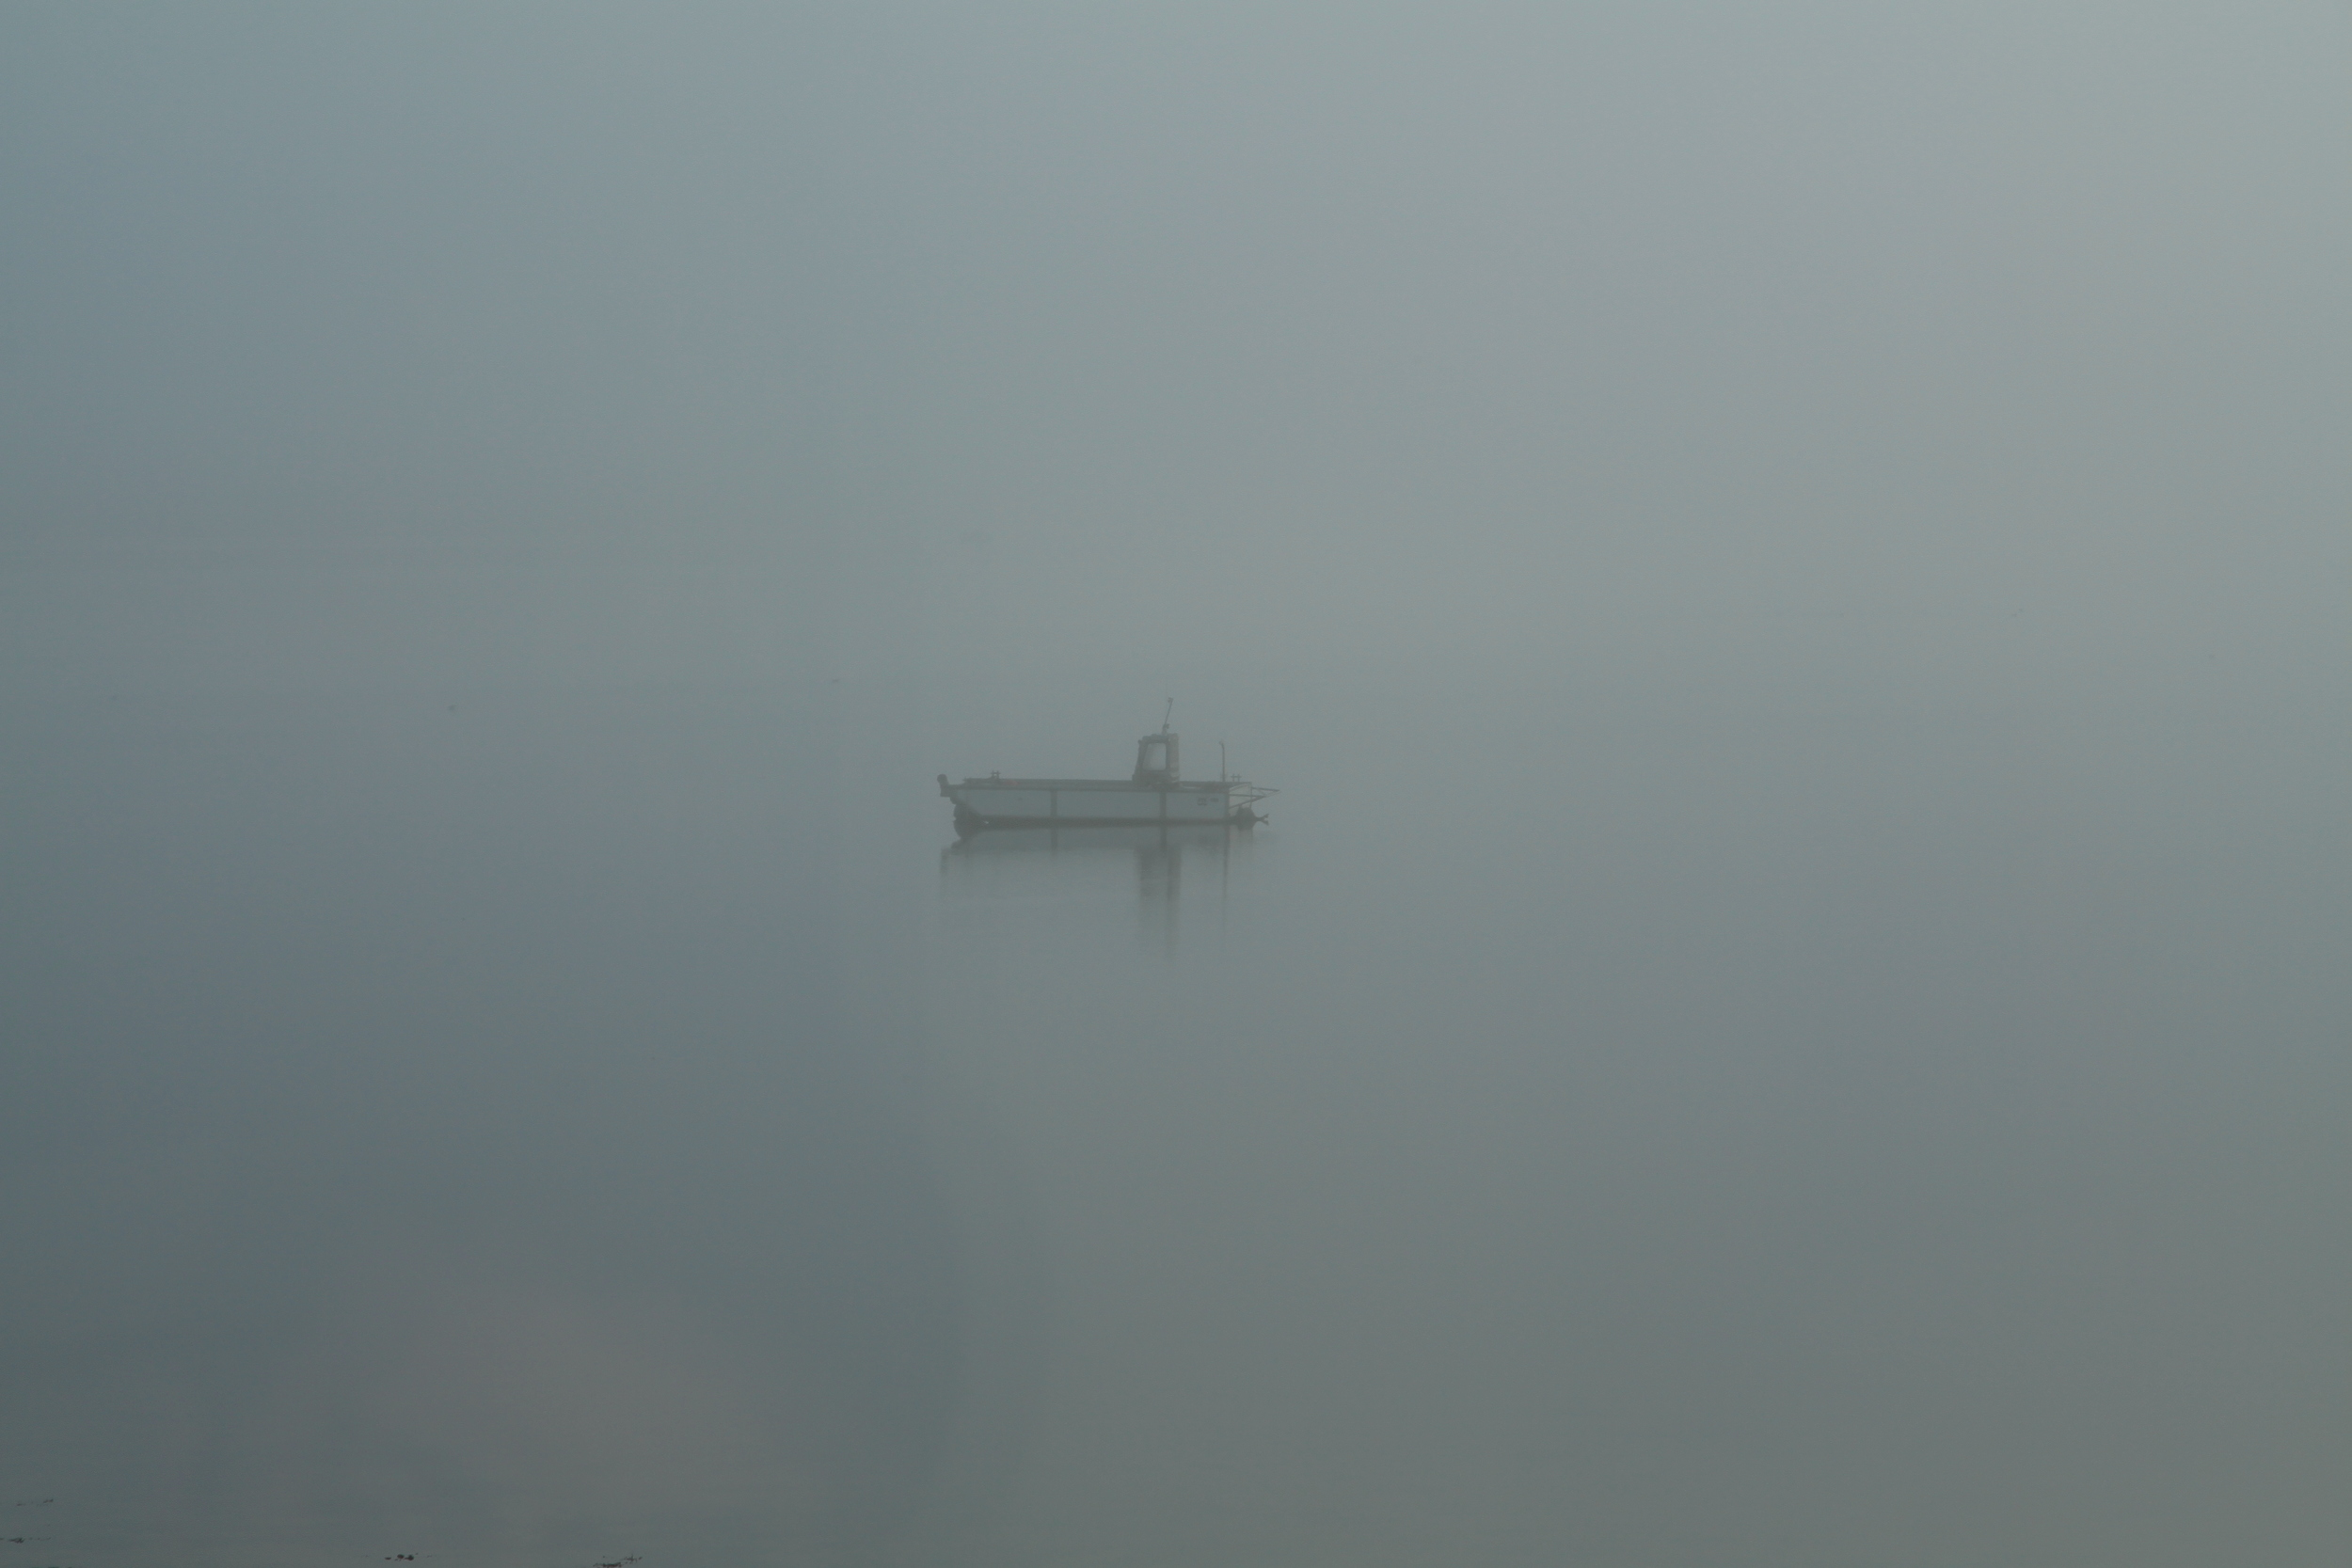 Early morning on Loch Fyne.